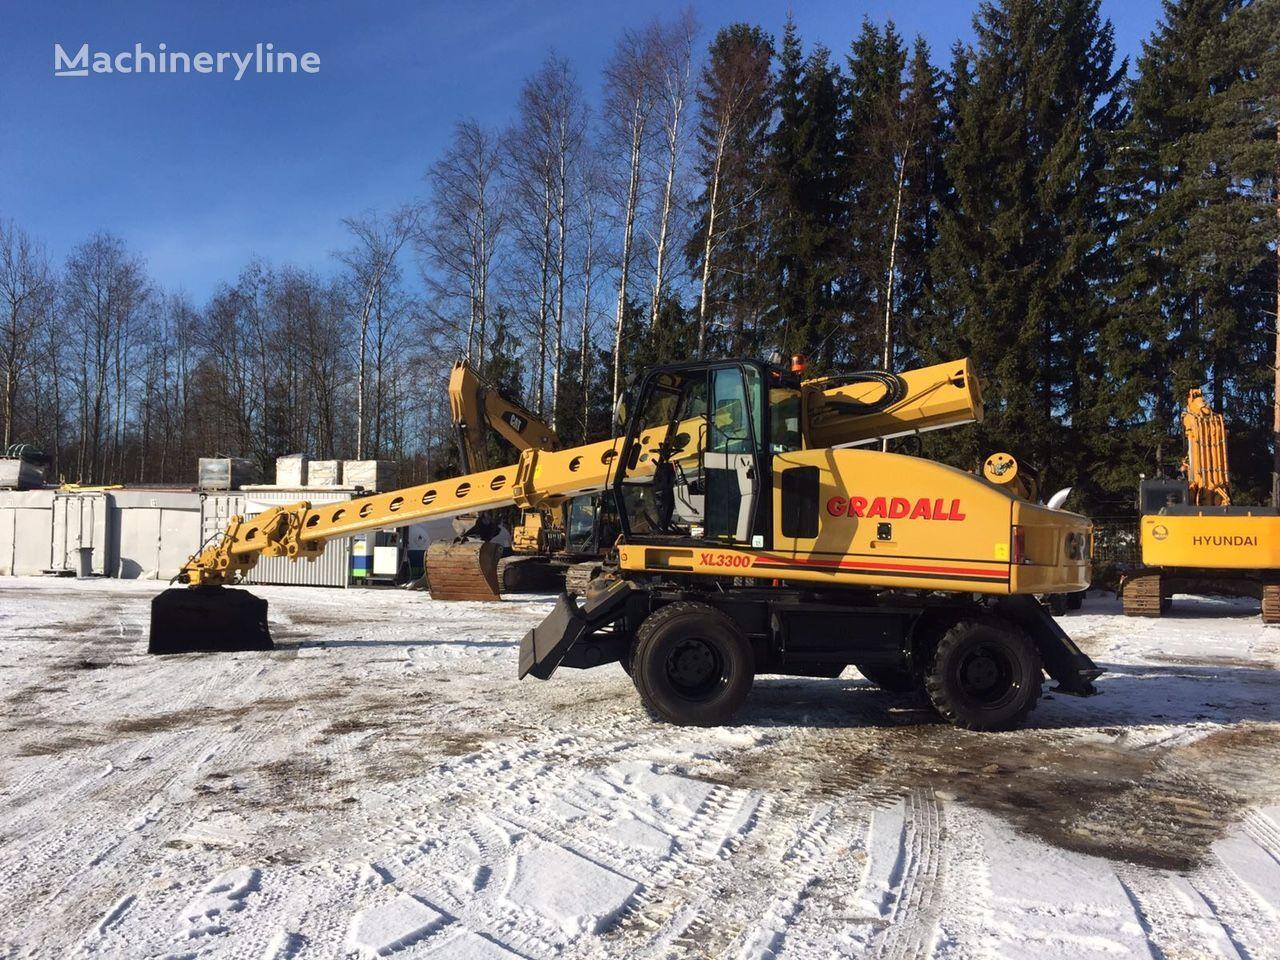 GRADALL XL 3300 excavadora de ruedas